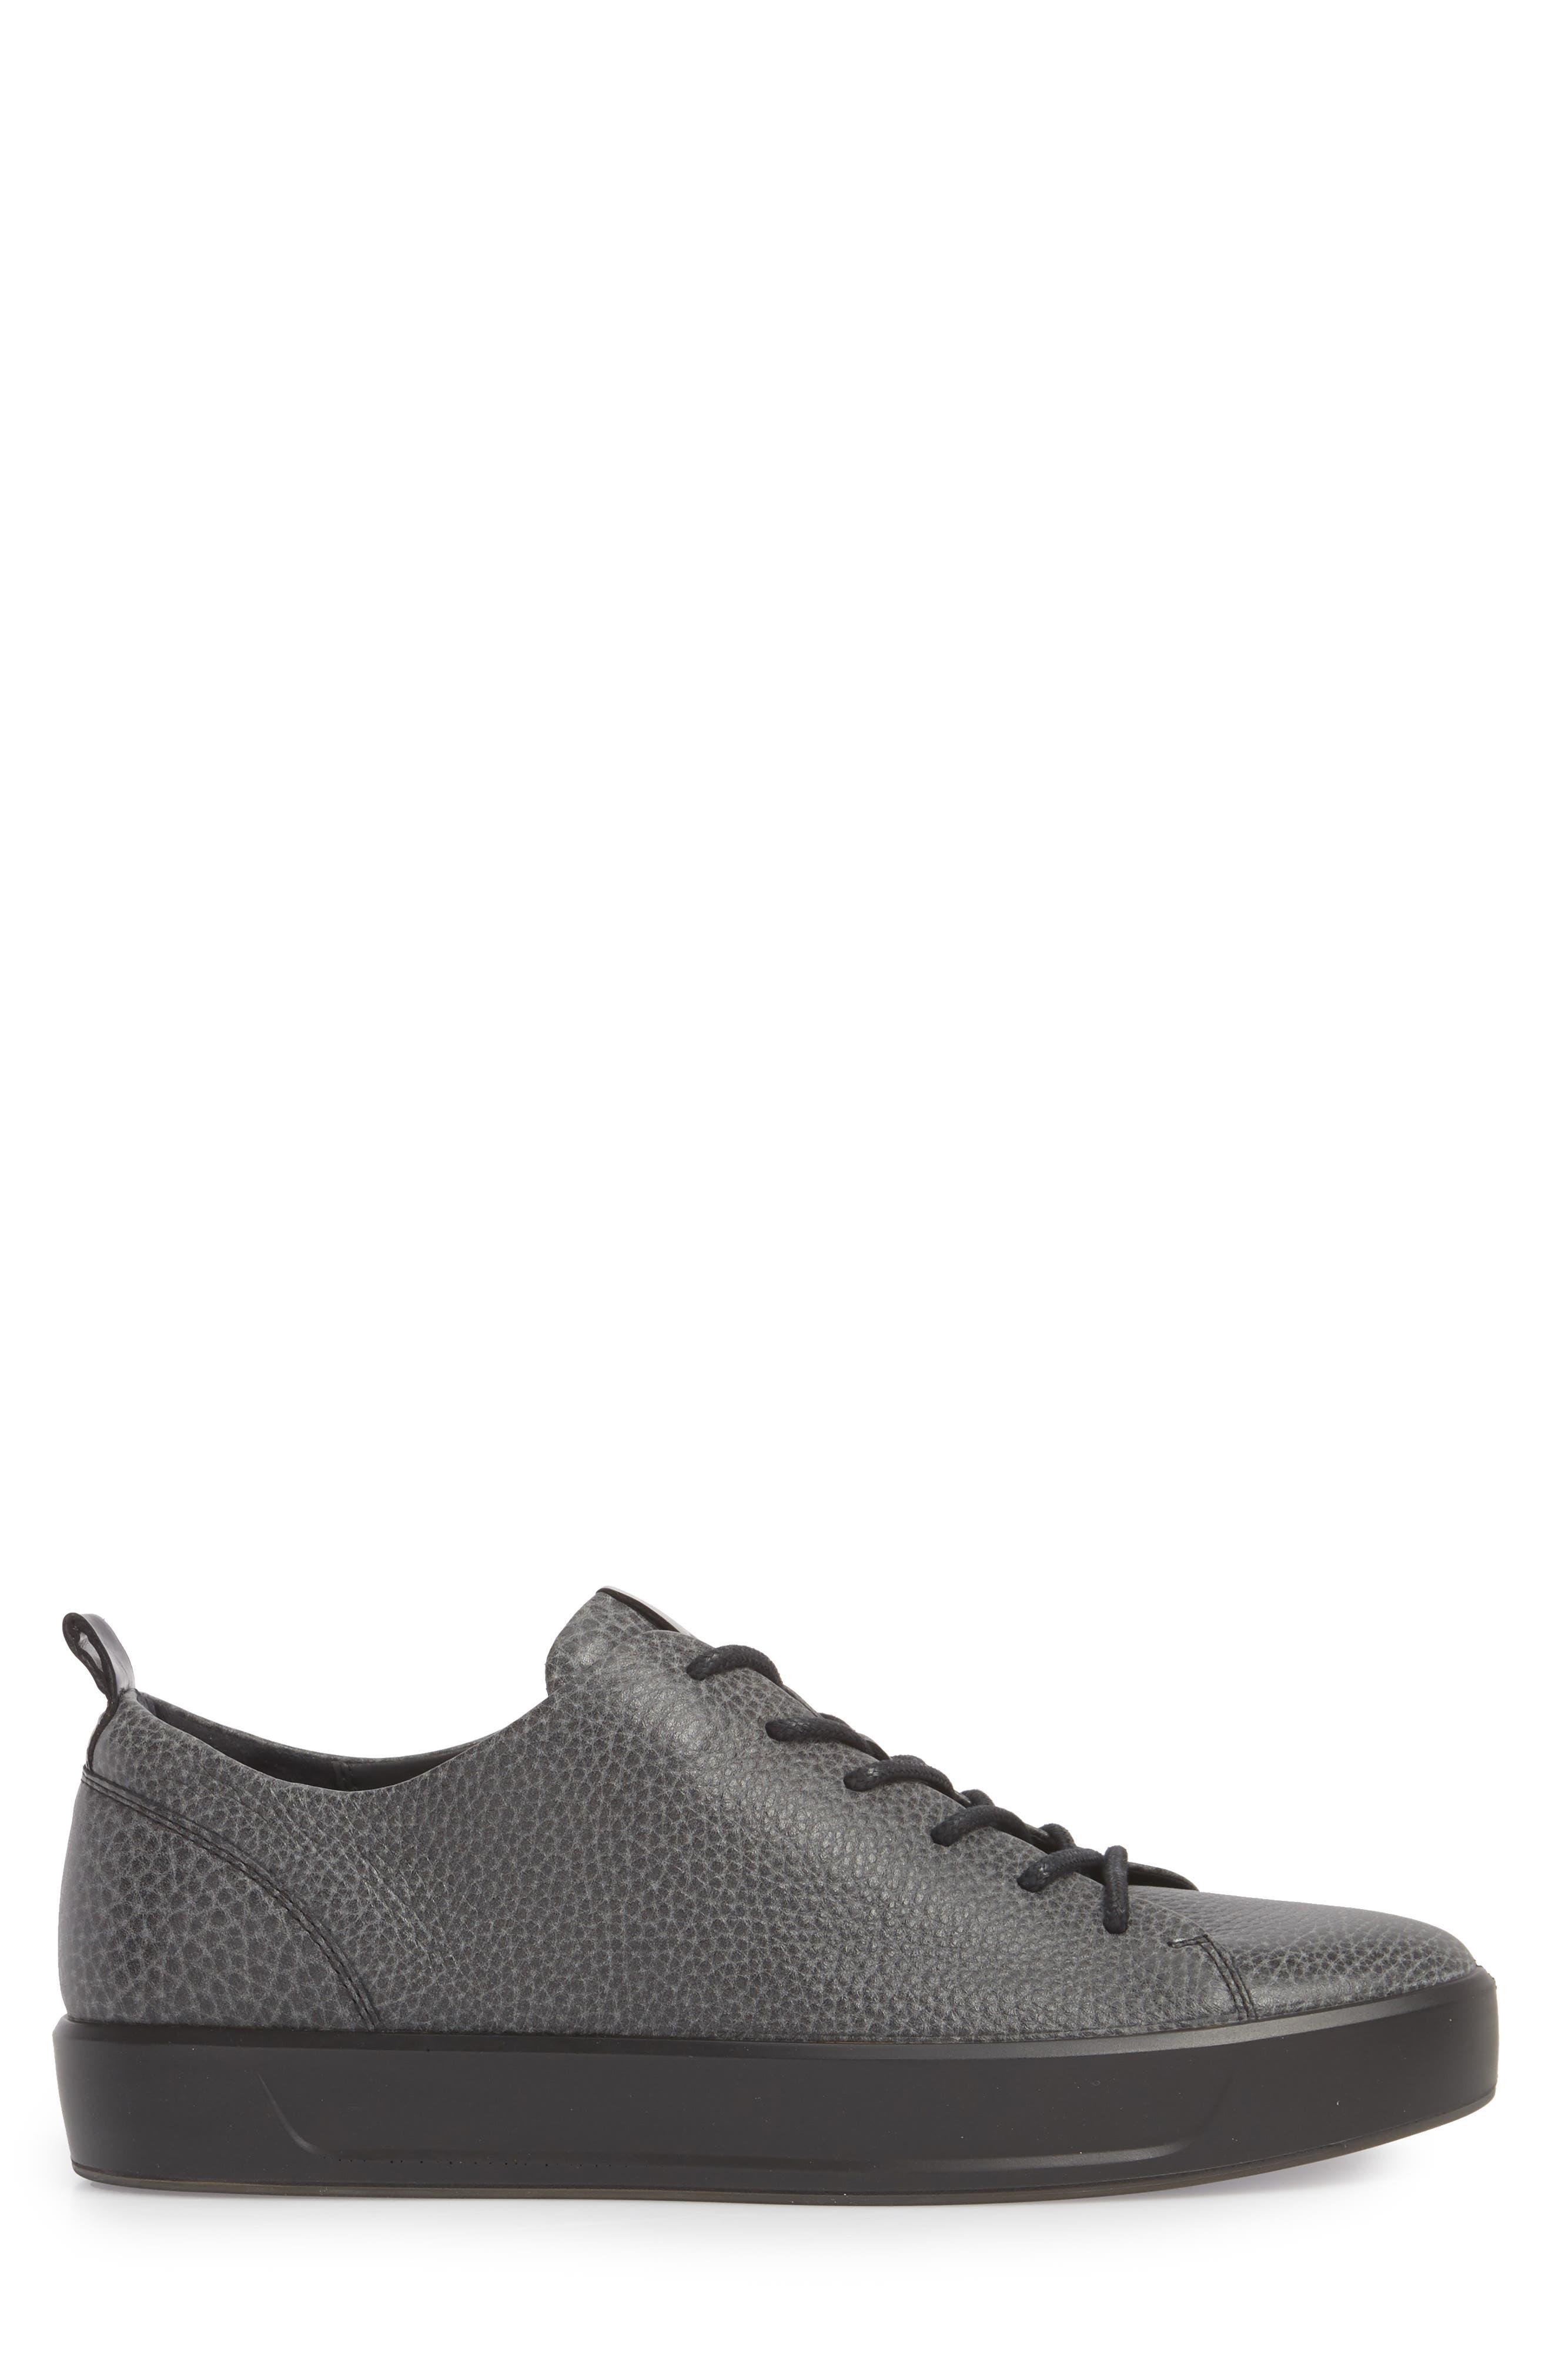 Soft 8 Tie II Low Top Sneaker,                             Alternate thumbnail 3, color,                             BLACK